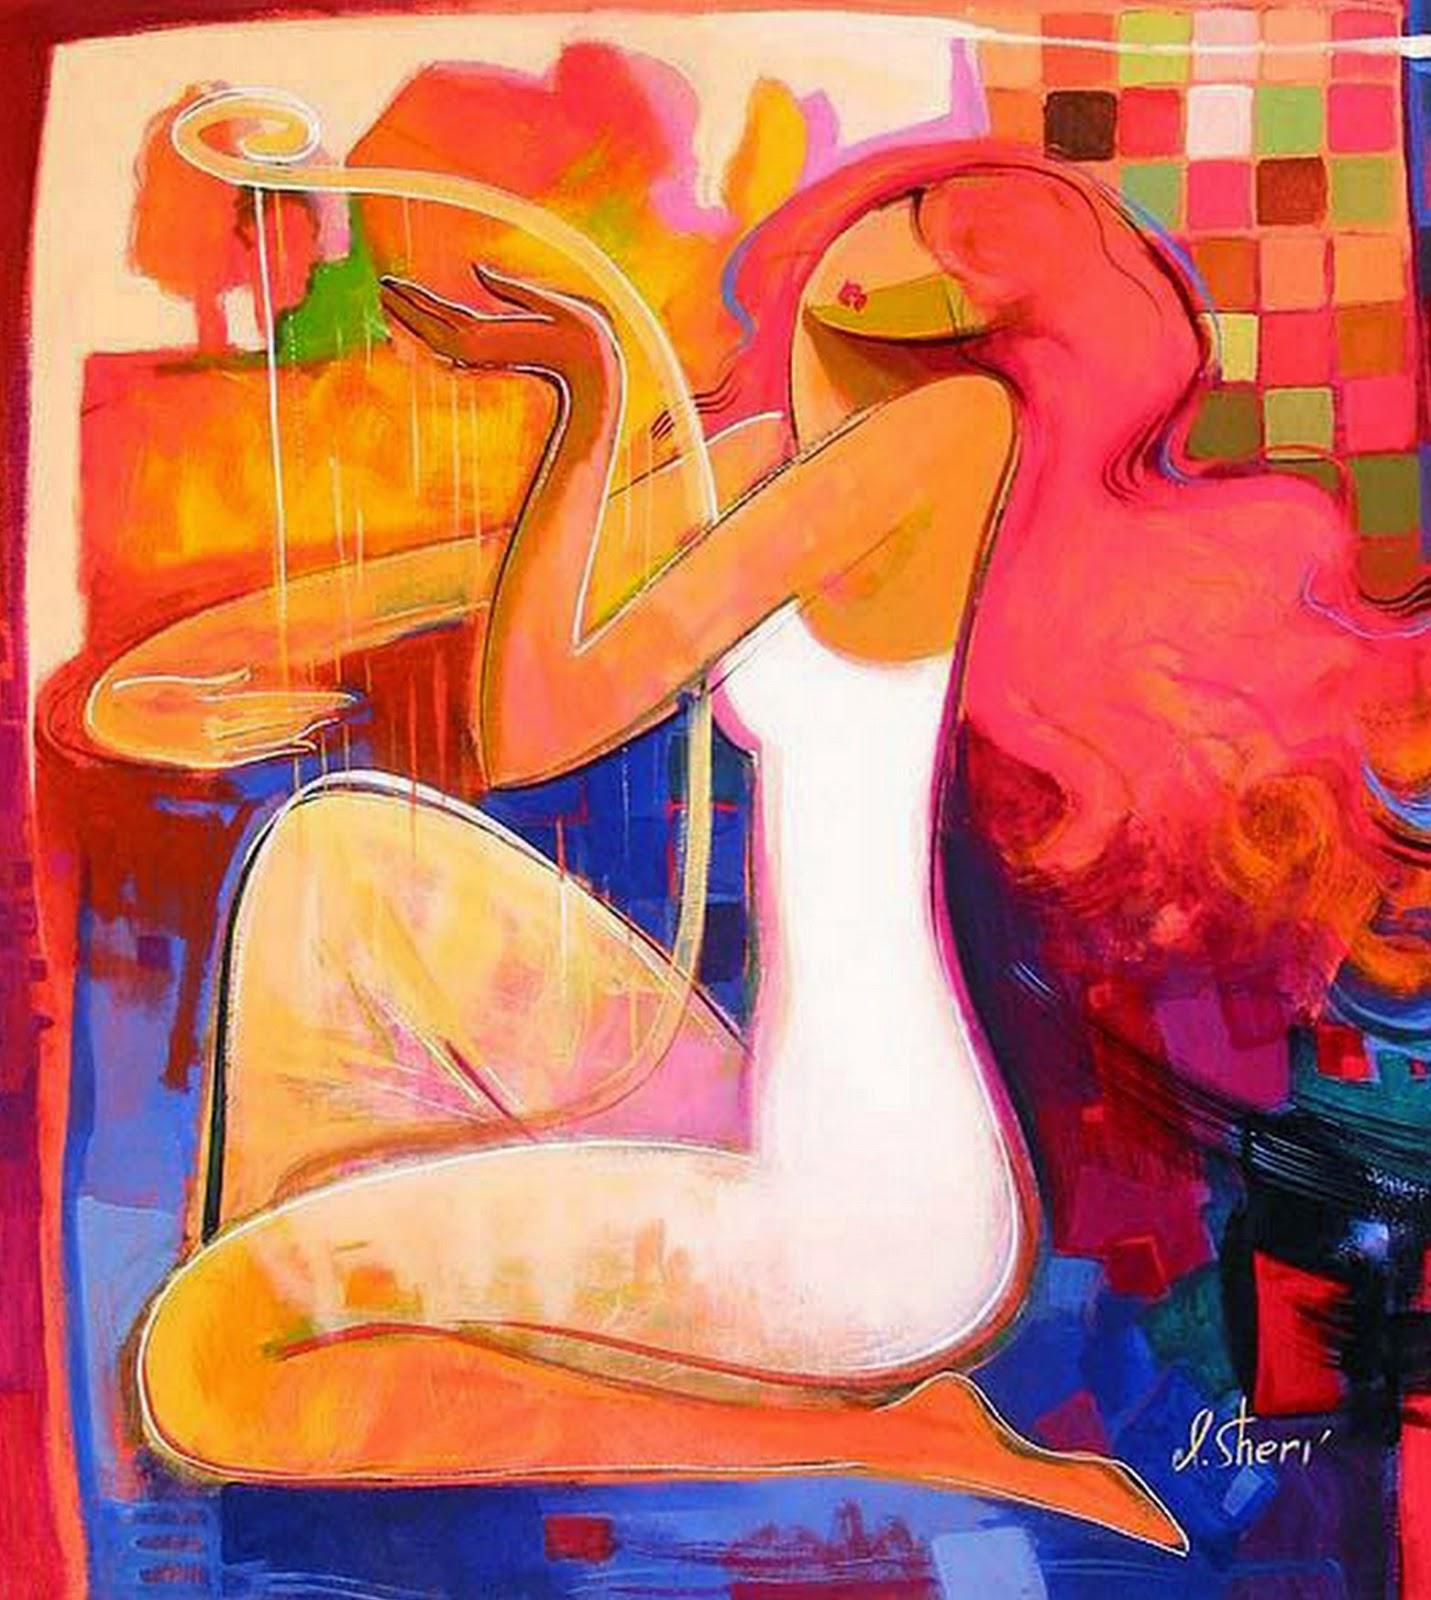 mujeres-cuadros-modernos-chicas